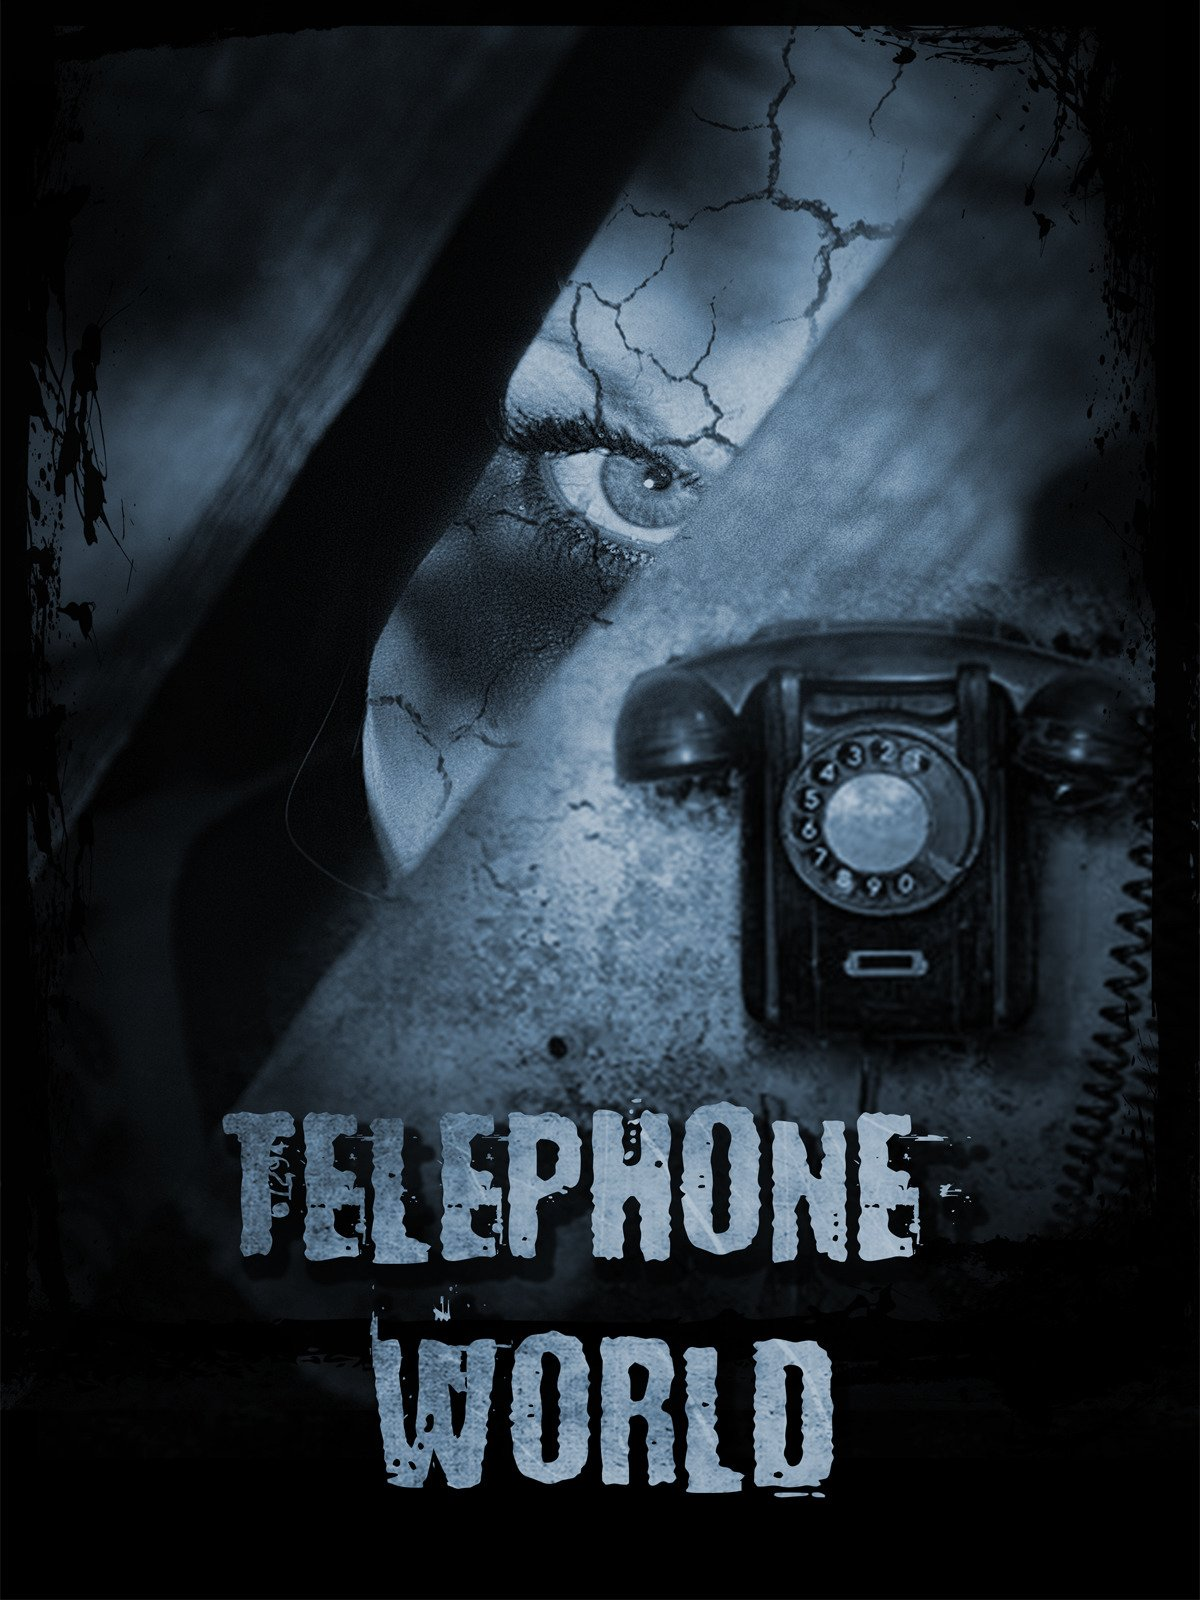 Telephone World